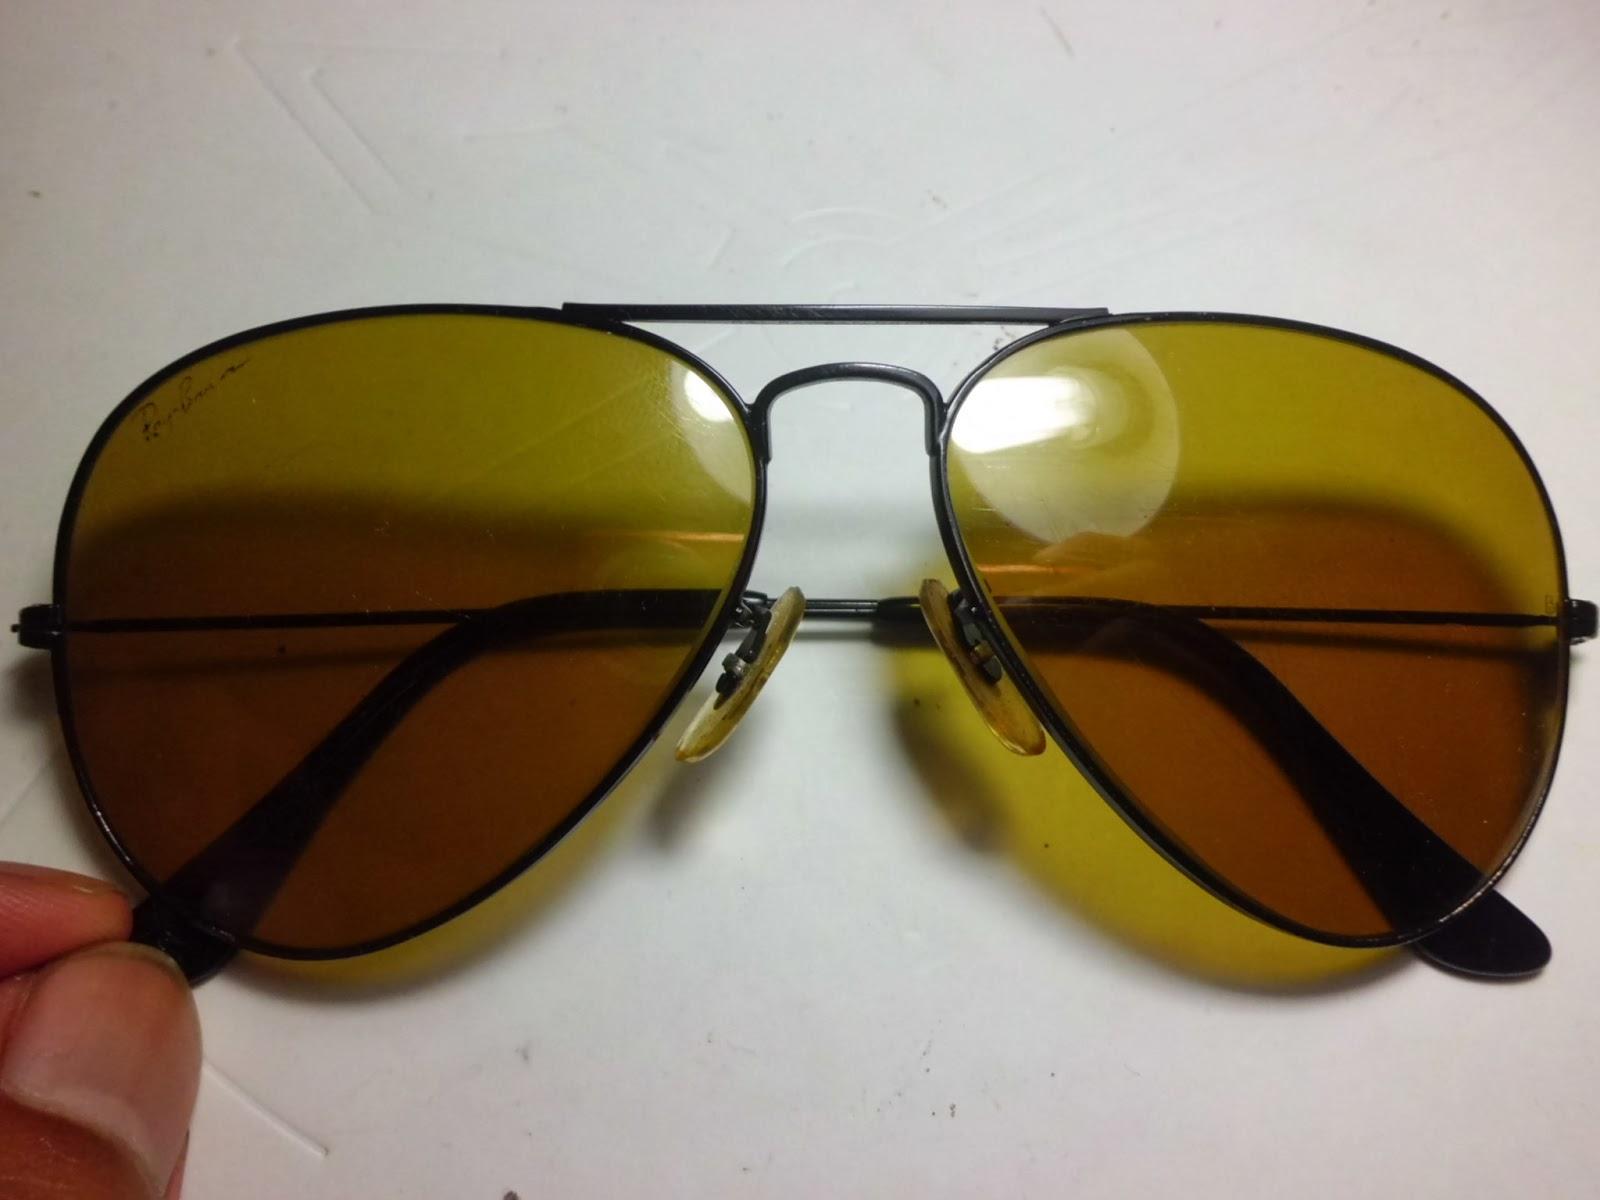 ... switzerland kacamata original norton brown lens harga rp 600.000 . kacamata  rayban aviator b4a32 0e1f8 86cda37f40